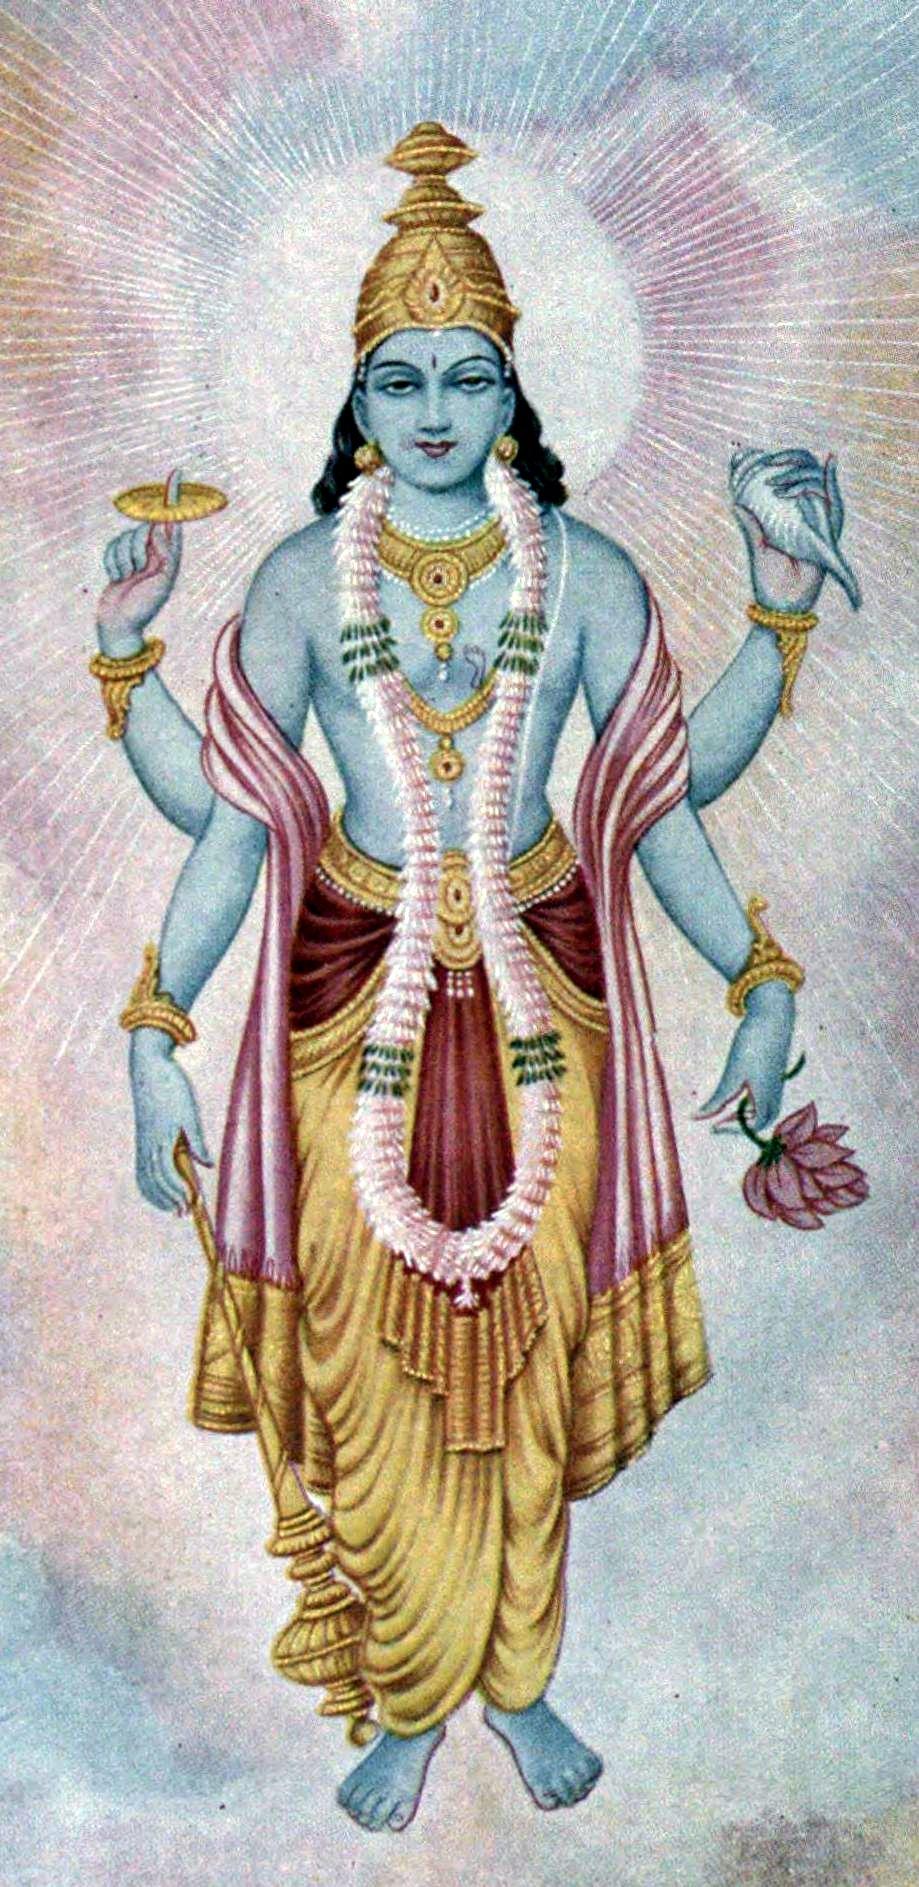 Mahabharata06ramauoft_0678